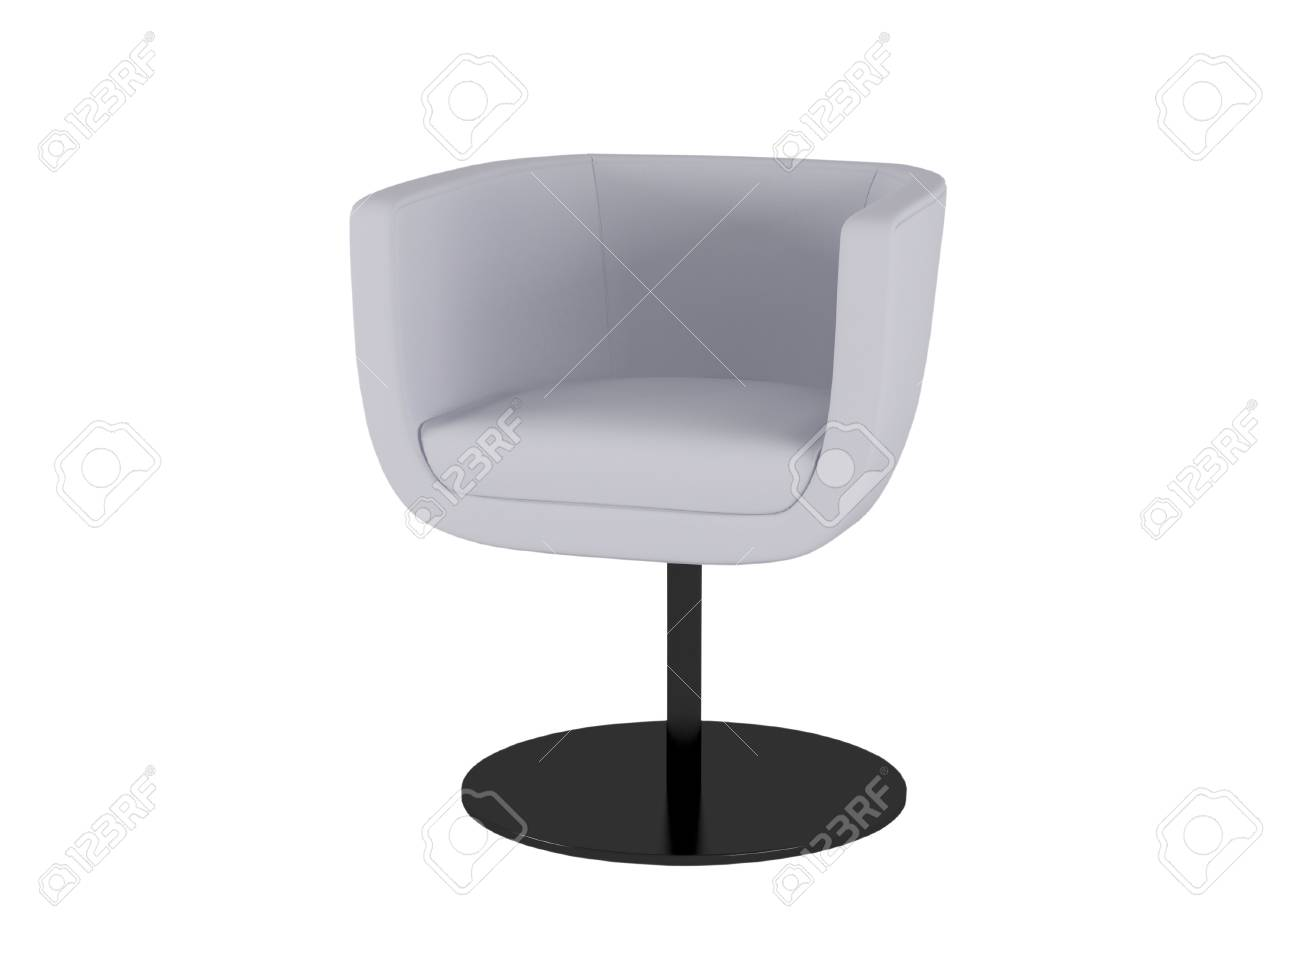 Fauteuils de bureau blanc fauteuil bureau blanc frais fauteuil